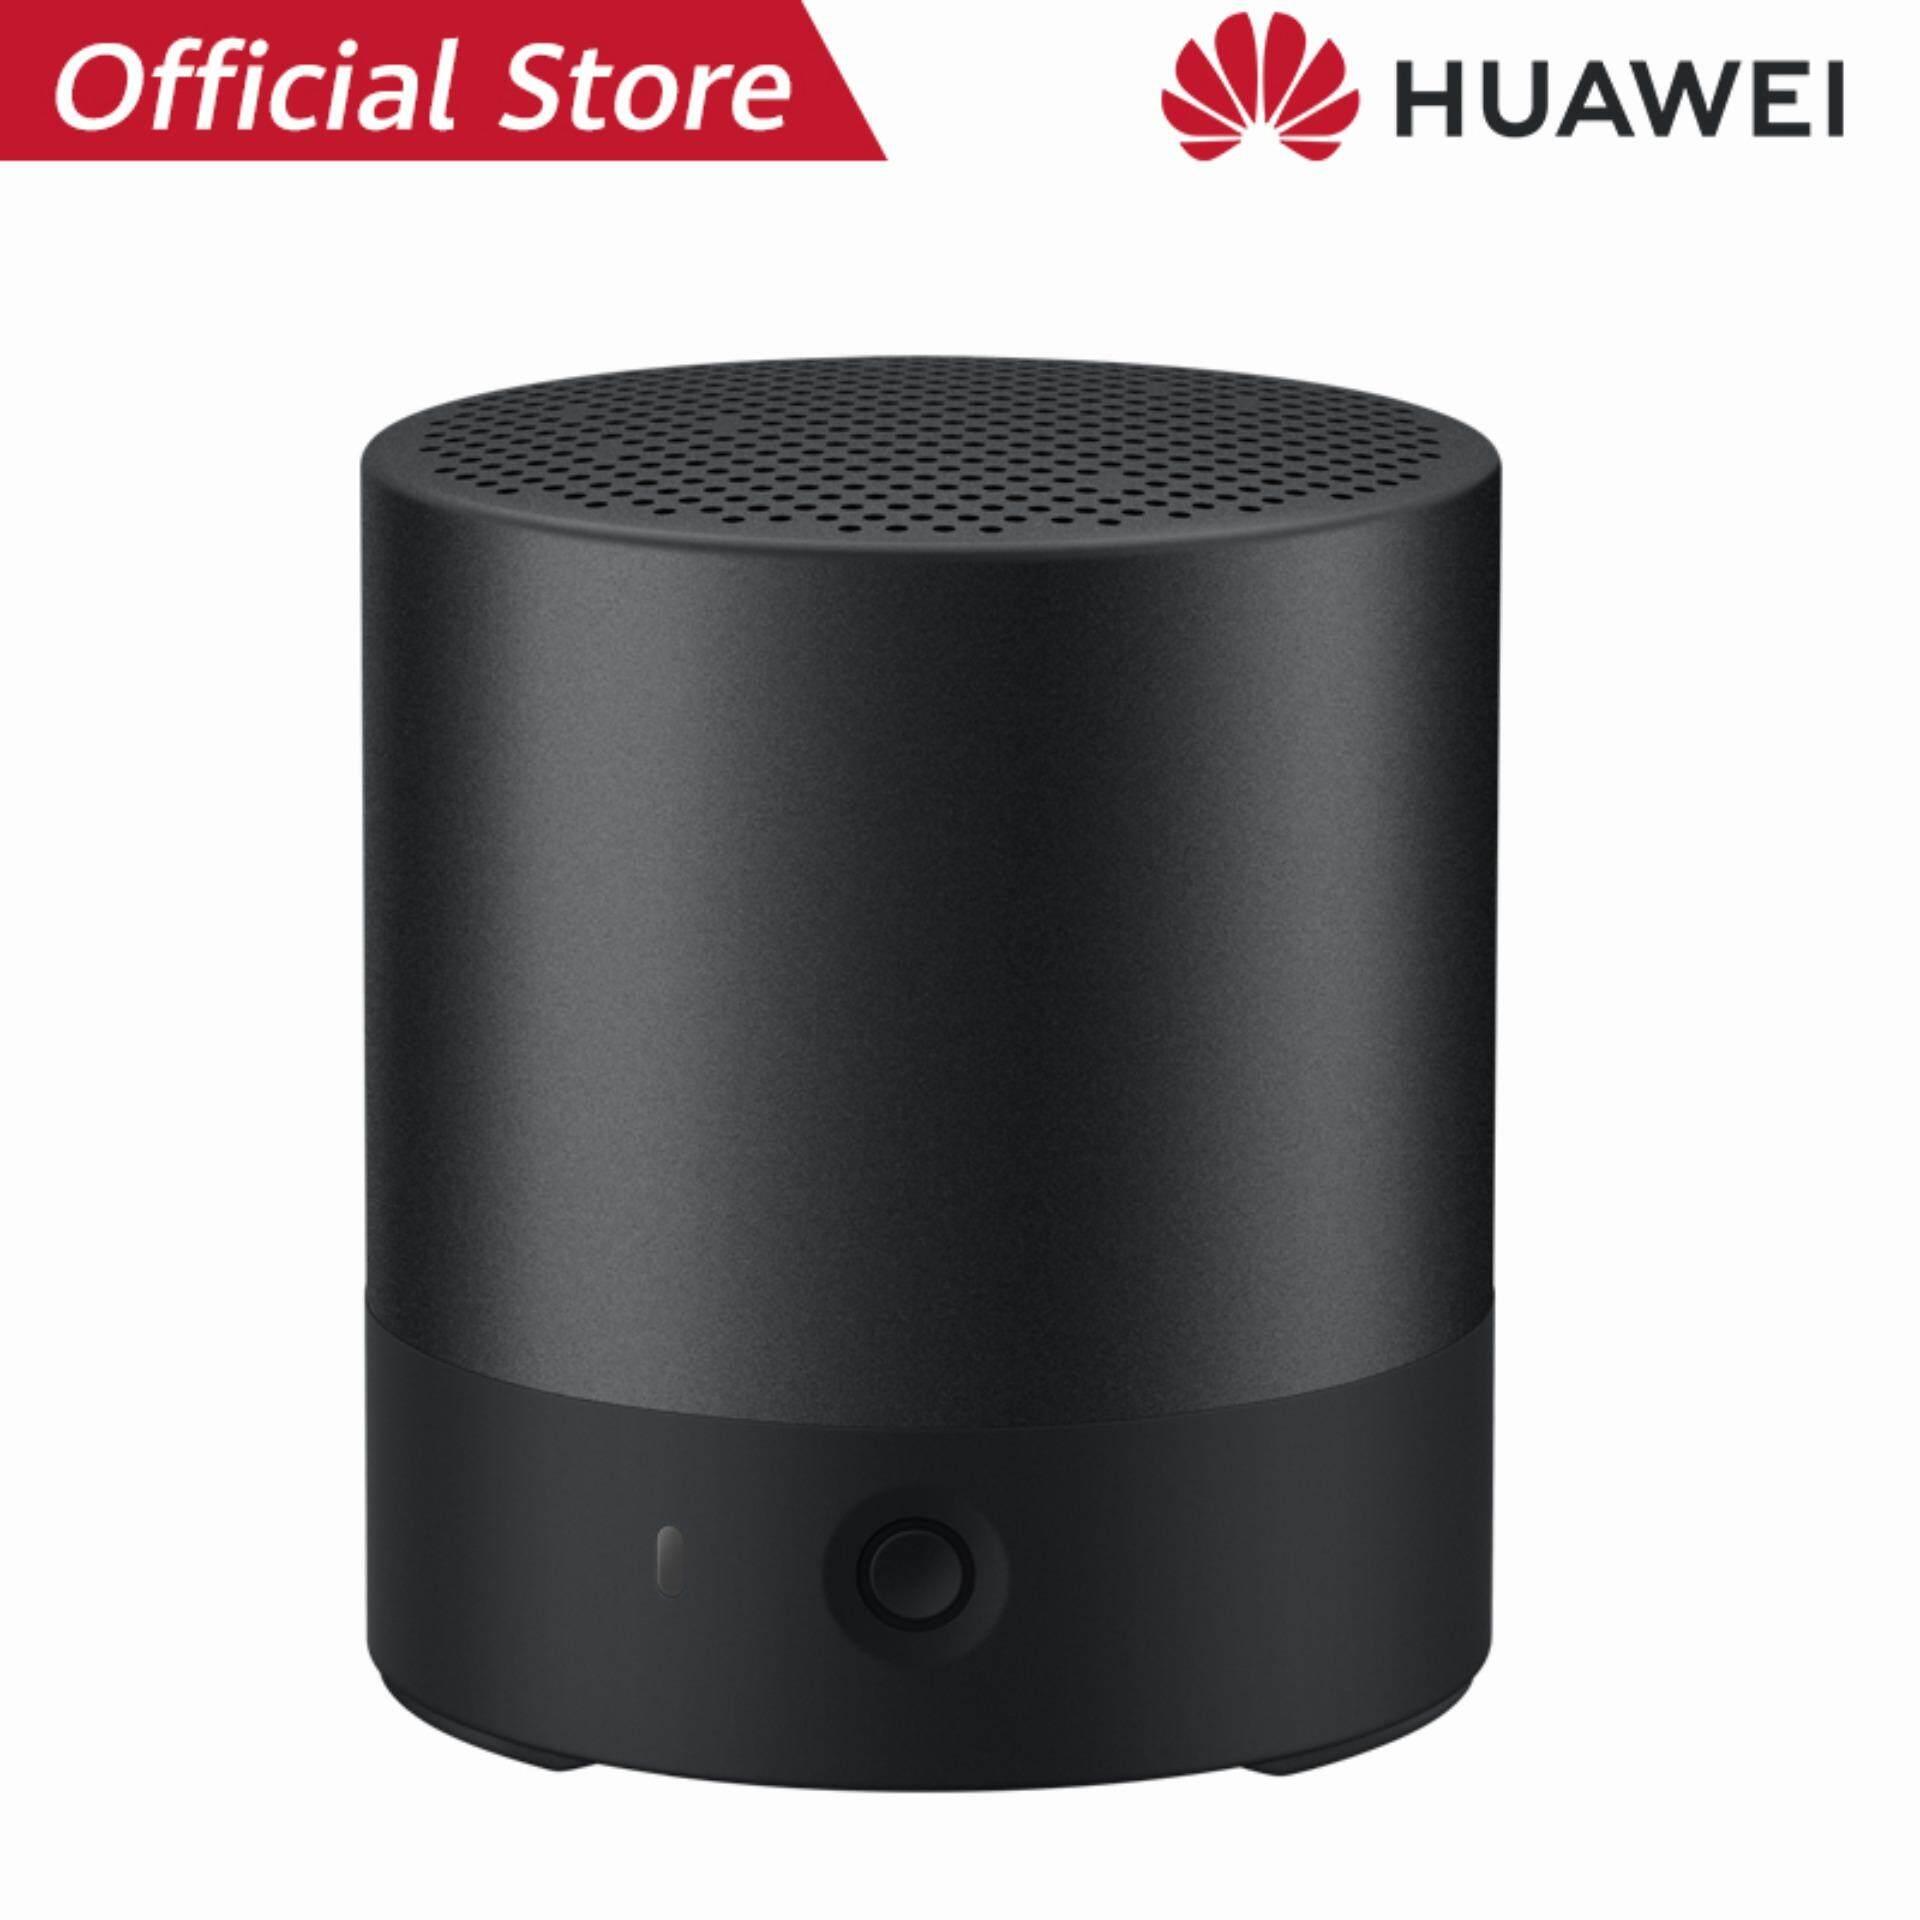 Huawei Mini Speaker หนึ่งวันกับแก็ตเจ็ตจาก huawei ที่เพิ่มความสมาร์ทให้ชีวิตประจำวันของเรา - หนึ่งวันกับแกดเจ็ตจาก HUAWEI ที่เพิ่มความสมาร์ทให้ชีวิตประจำวันของเรา